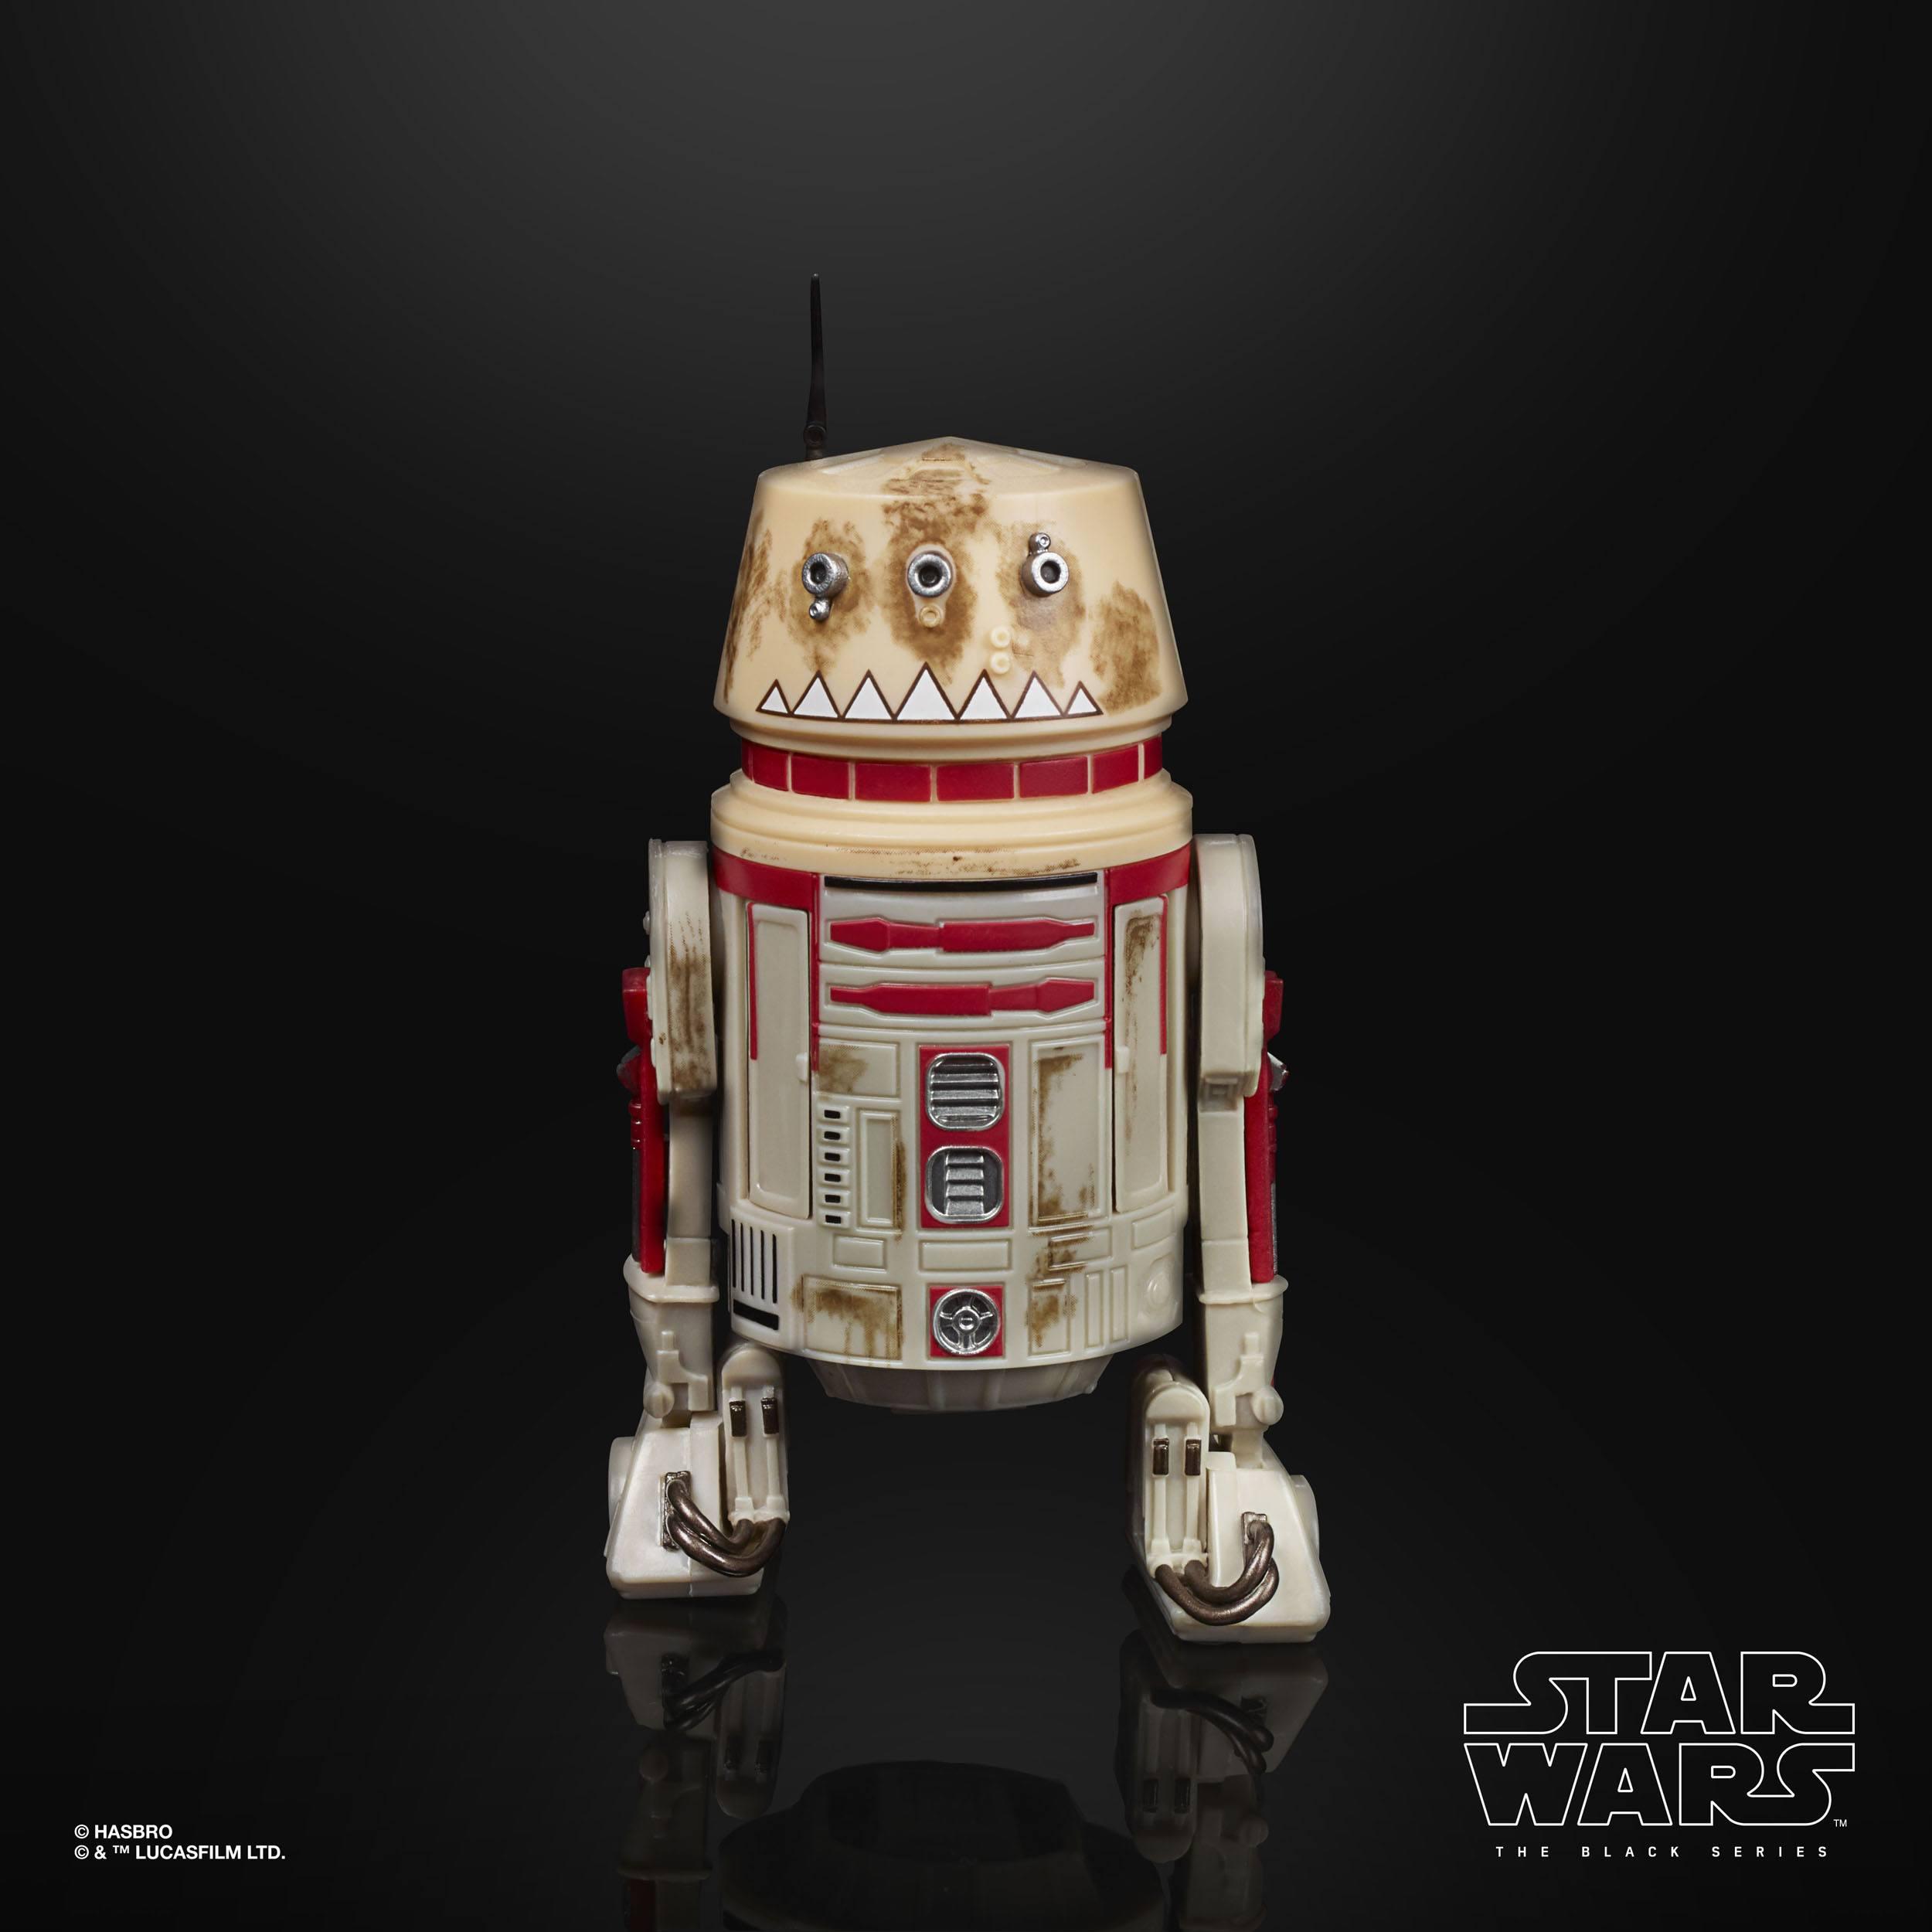 Star Wars Galaxy's Edge Black Series Actionfigur 2020 R5-P8 15 cm HASF1187 5010993773091